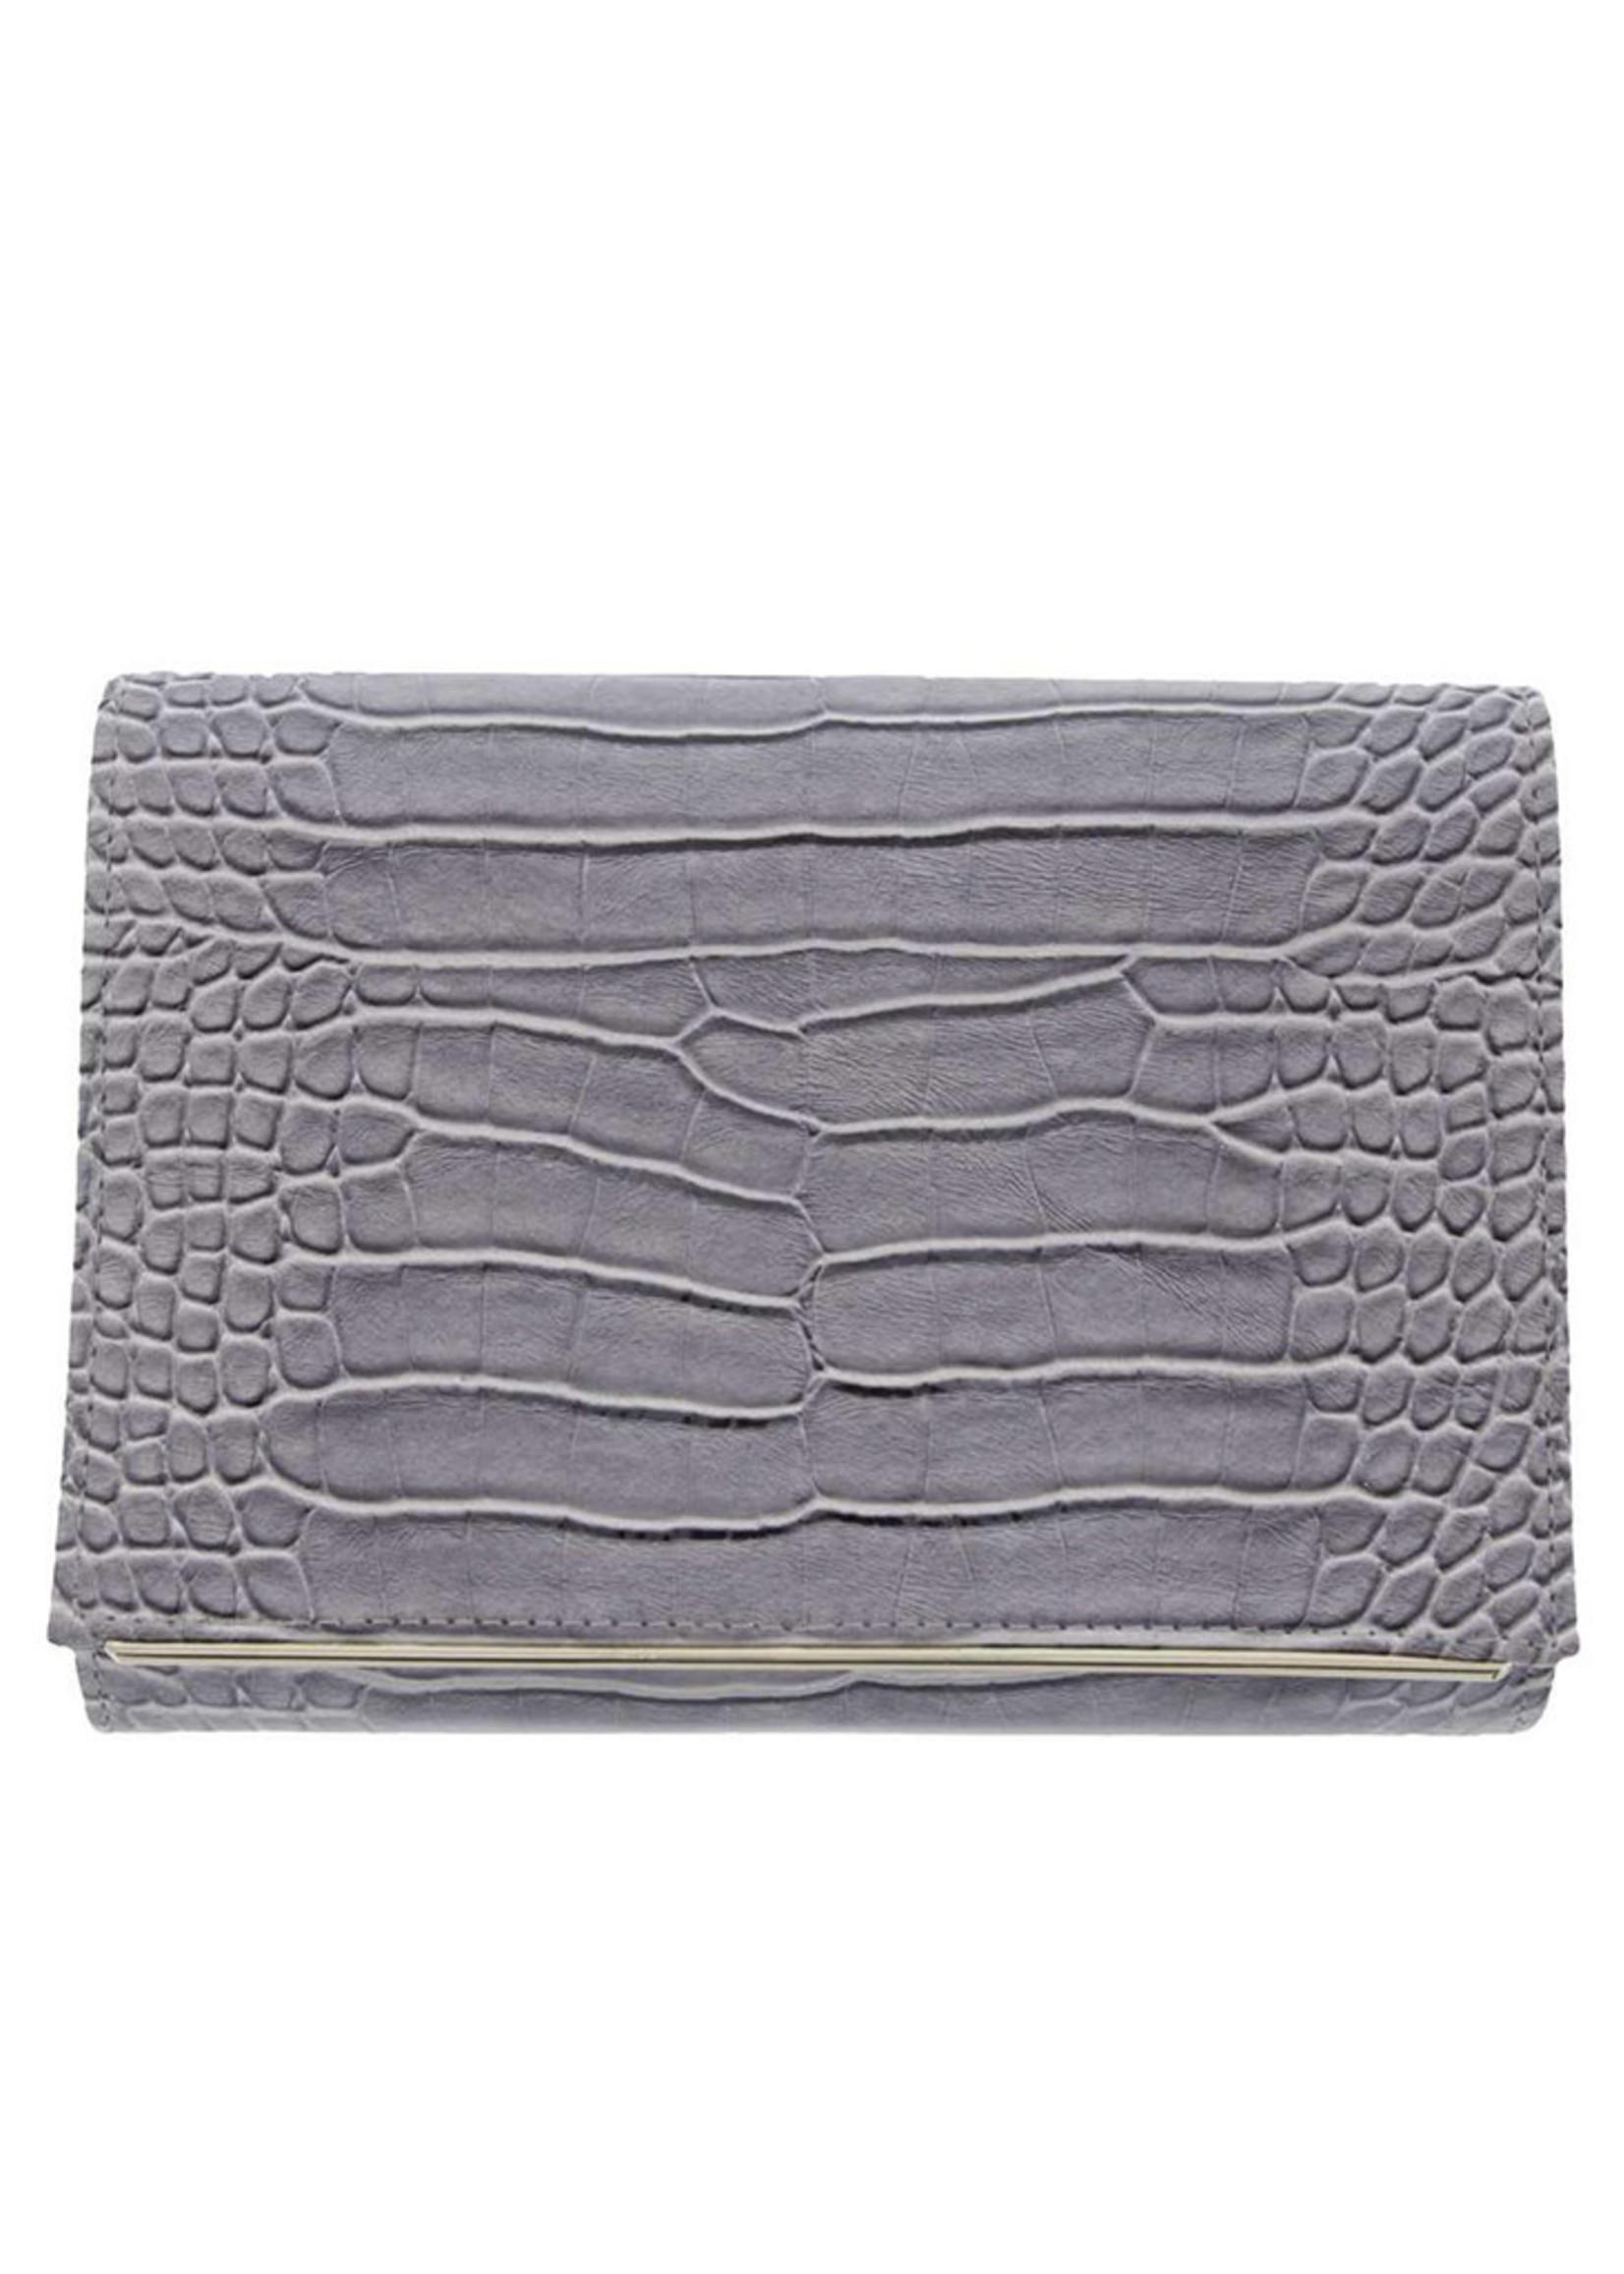 Gabee Products Nessa Croc Clutch - Grey